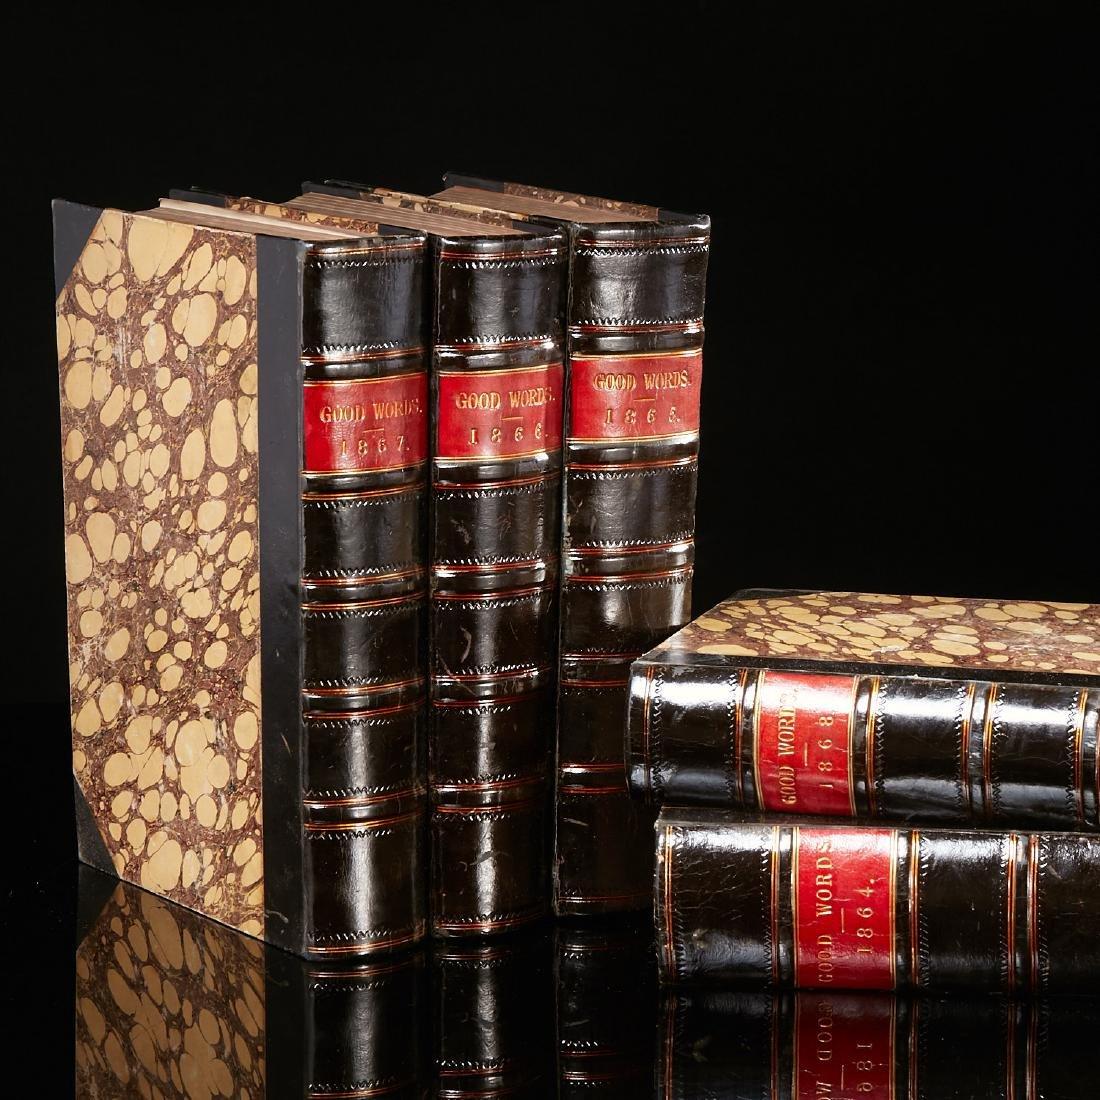 BOOKS: (5) Vol Good Words set 1864-8